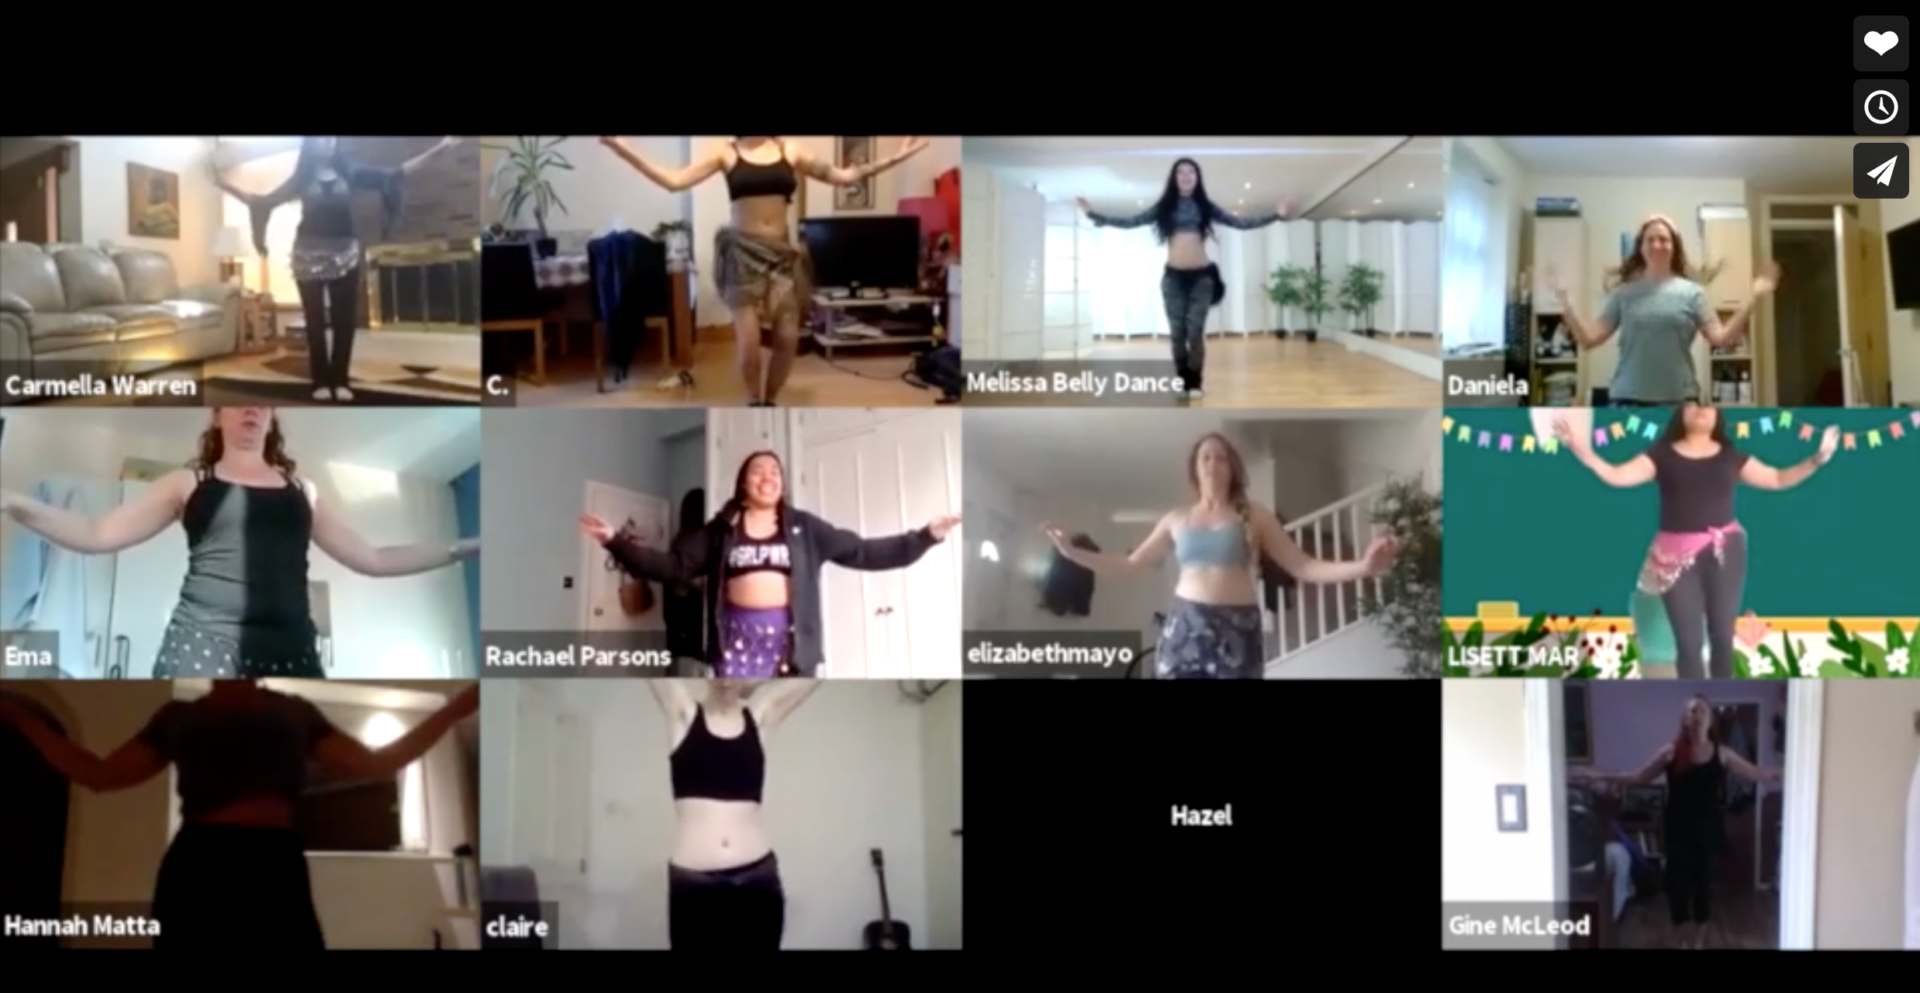 Melissa belly dance zoom class